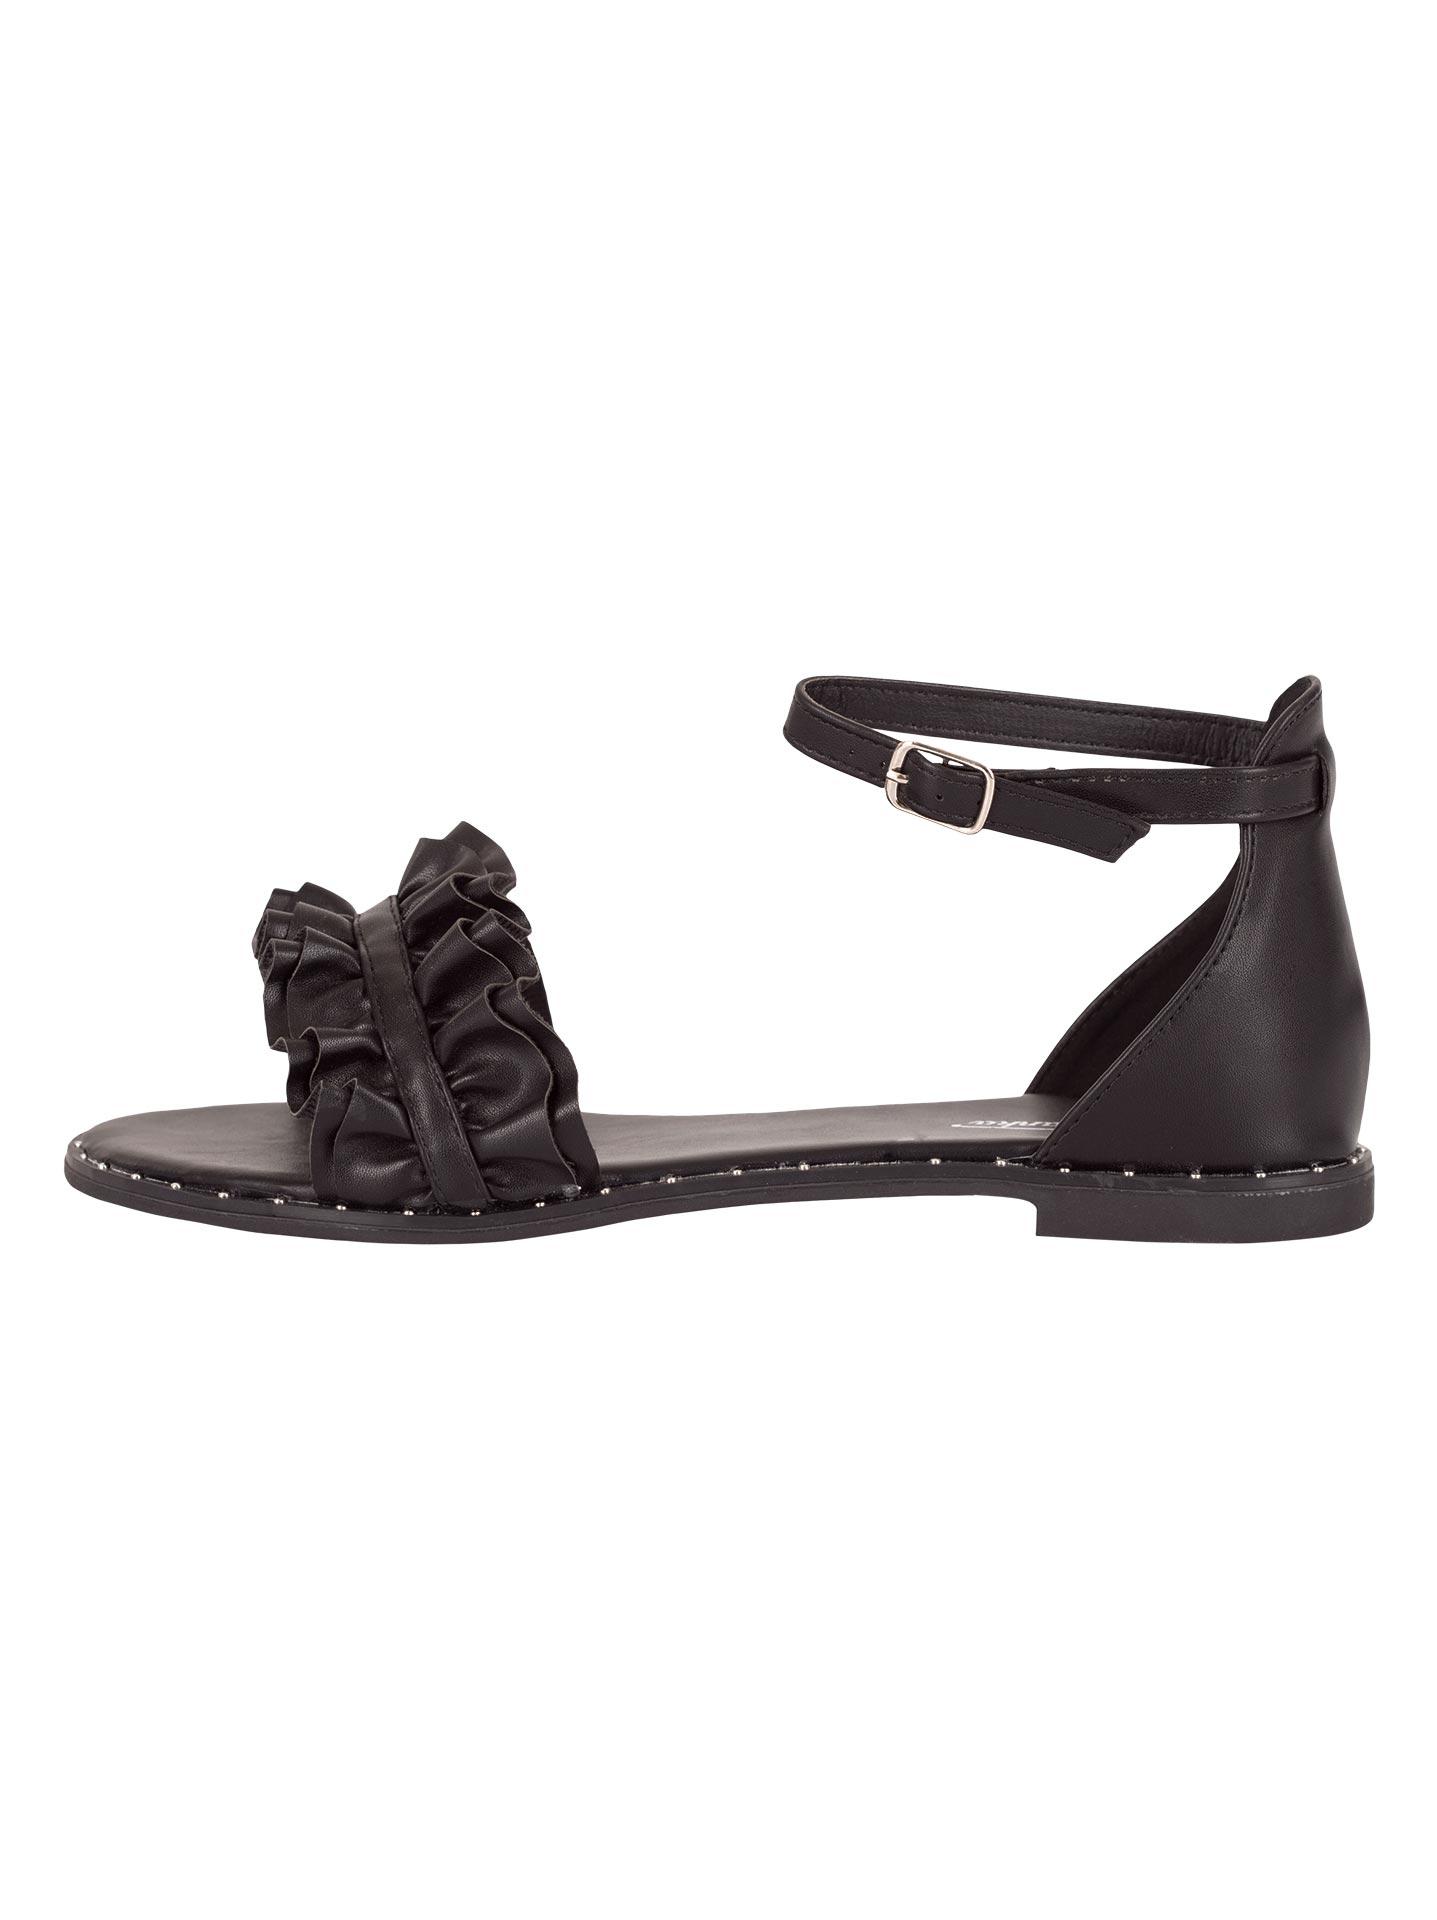 ed66062794a Flat σανδάλια με βολάν σε μαυρο, 10,95€ | Celestino